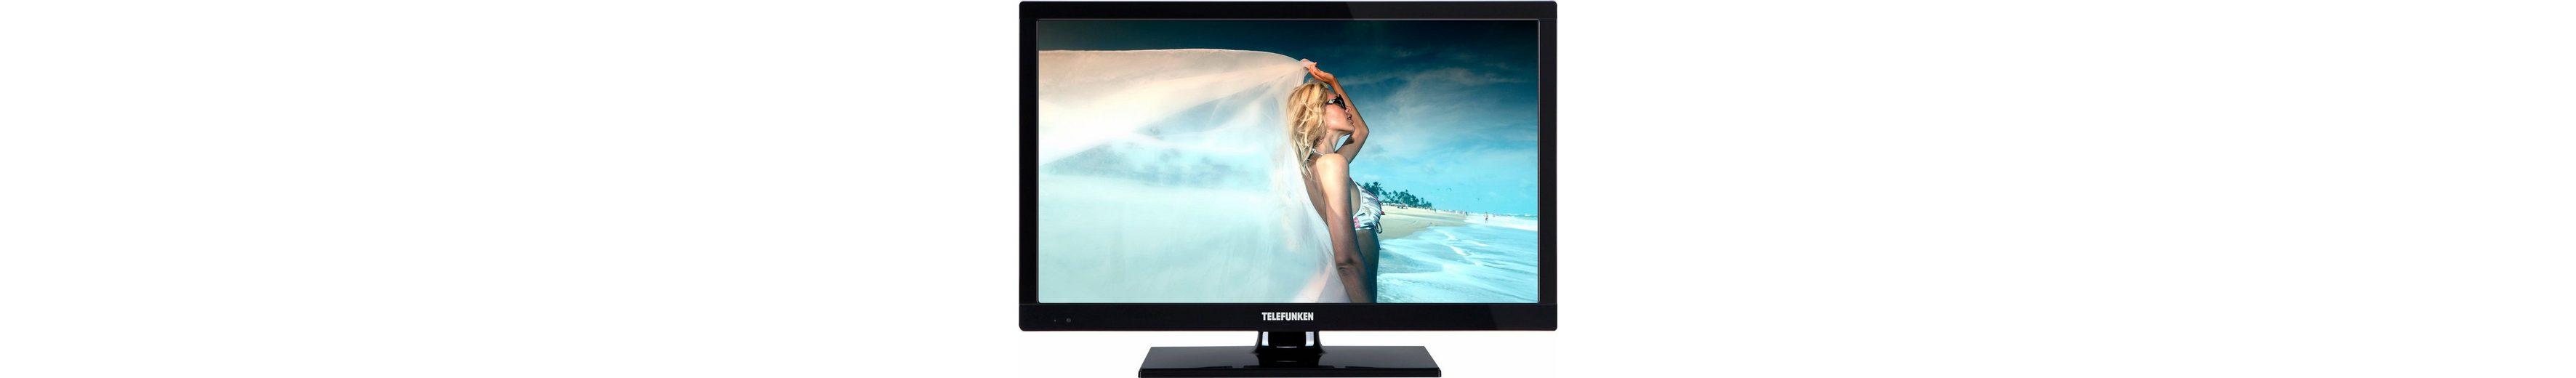 Telefunken L24H283M4, LED Fernseher, 61 cm (24 Zoll)